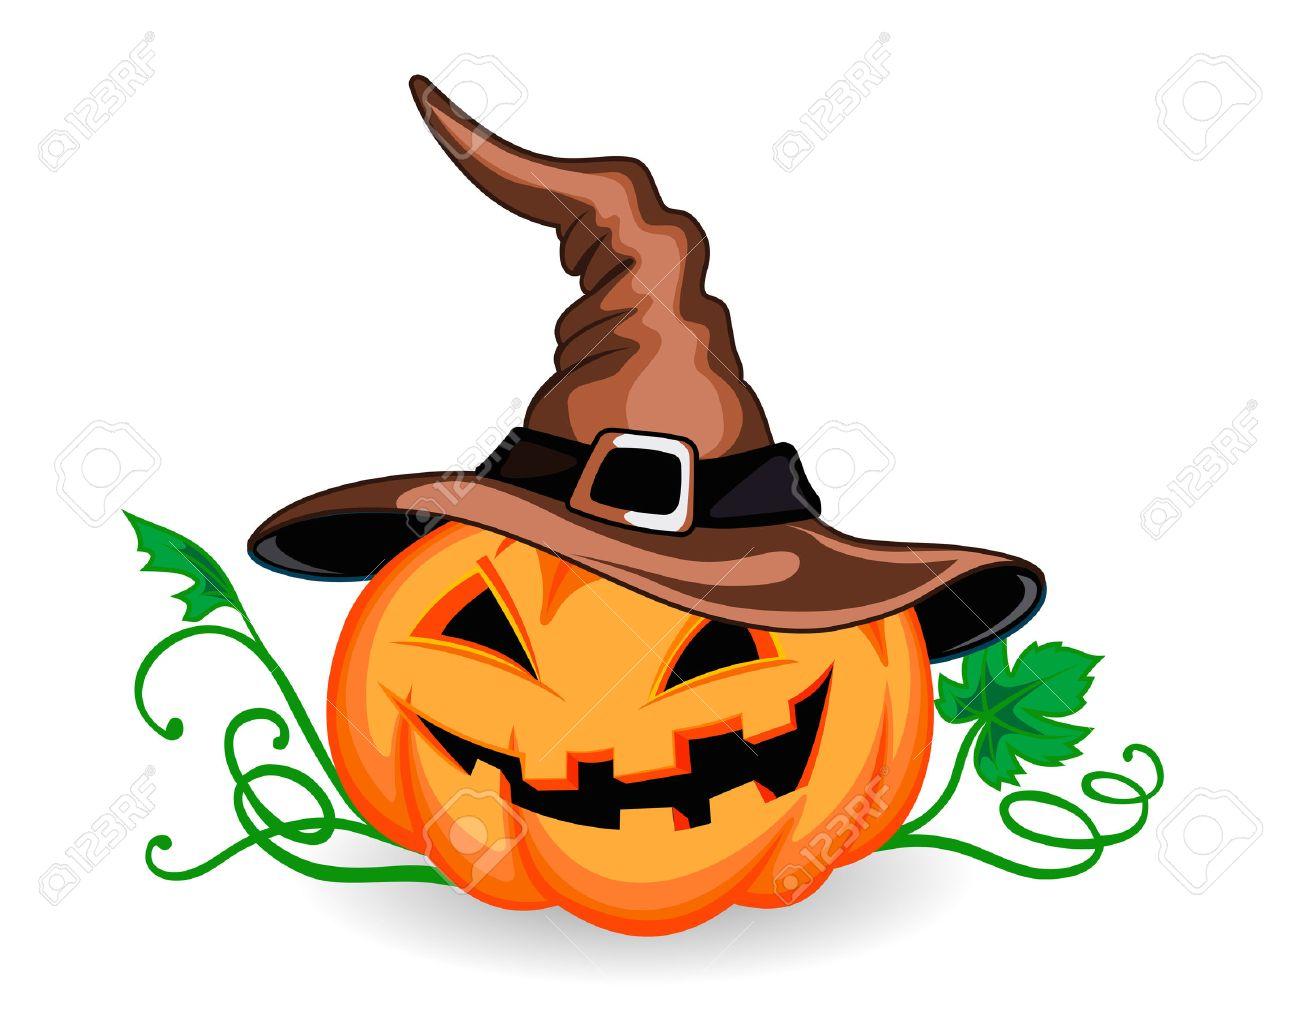 Halloween Pumpkin In Heat With Green Leaves Vector Illustration